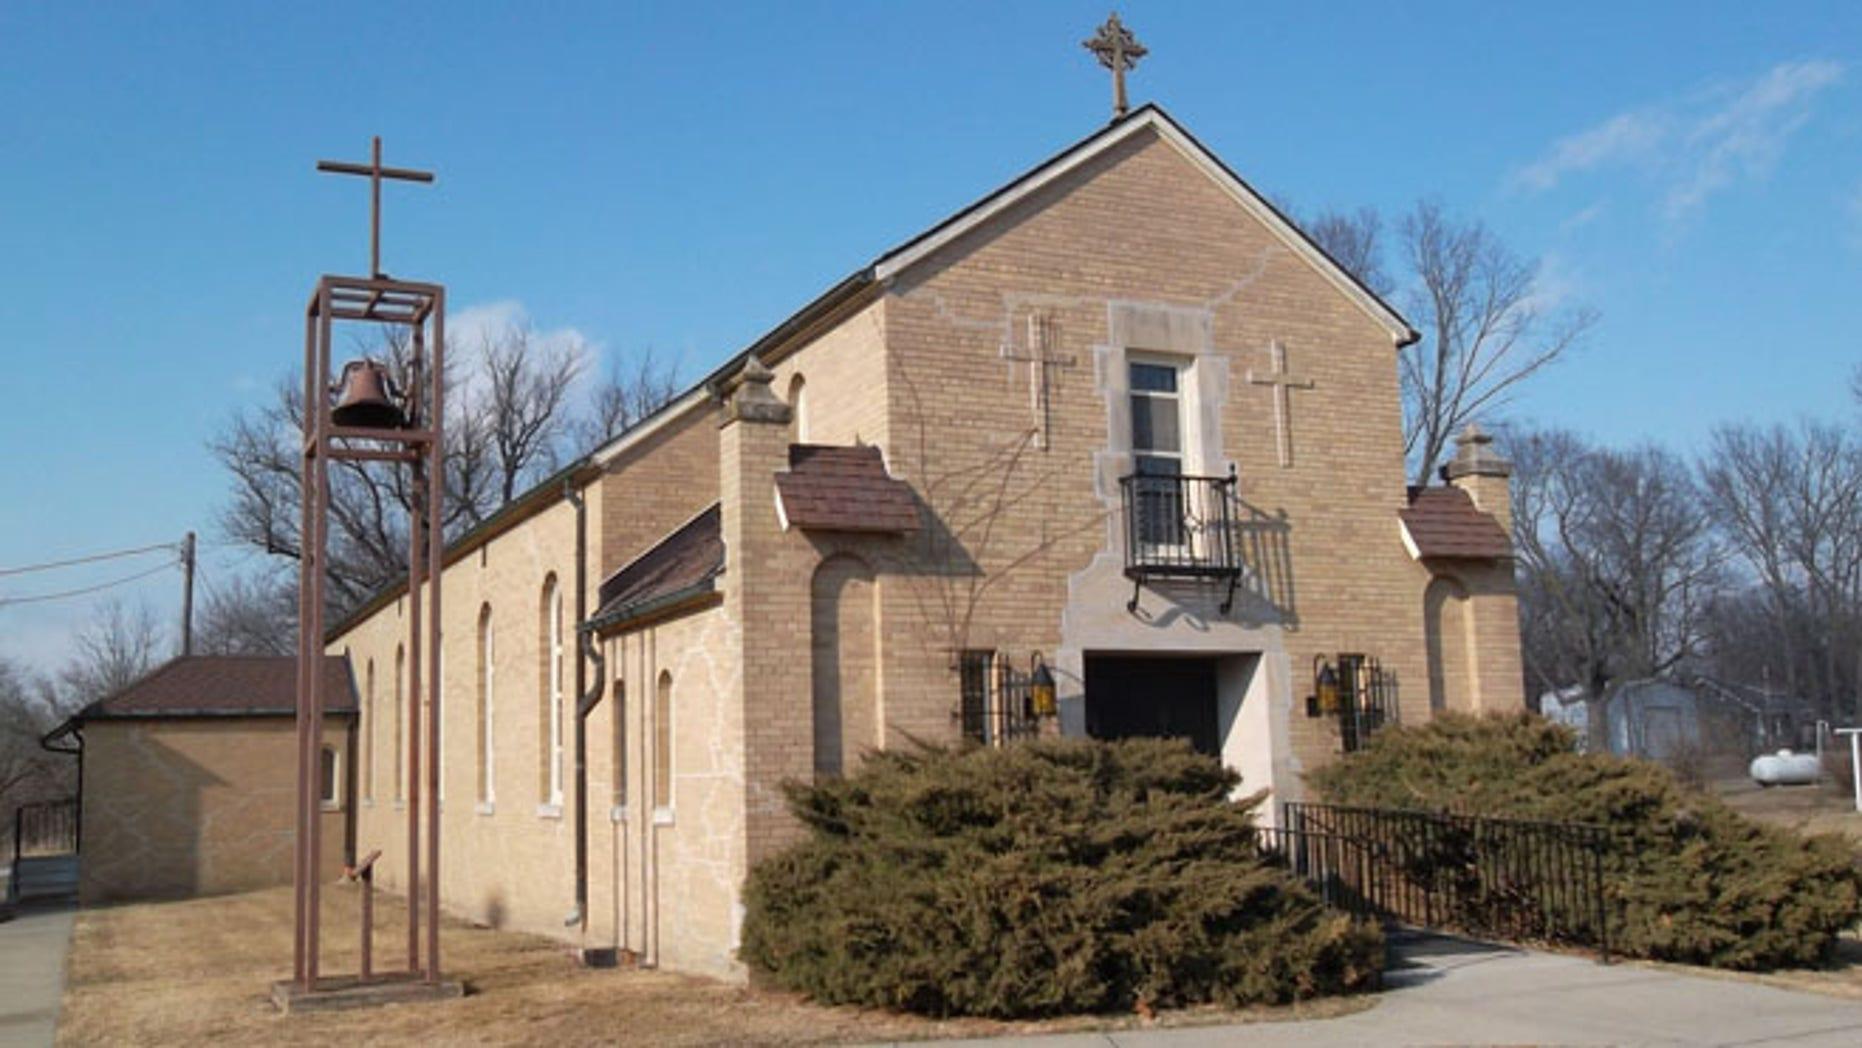 Church of the Assumption in Churchville, Iowa (Courtesy Karon King)